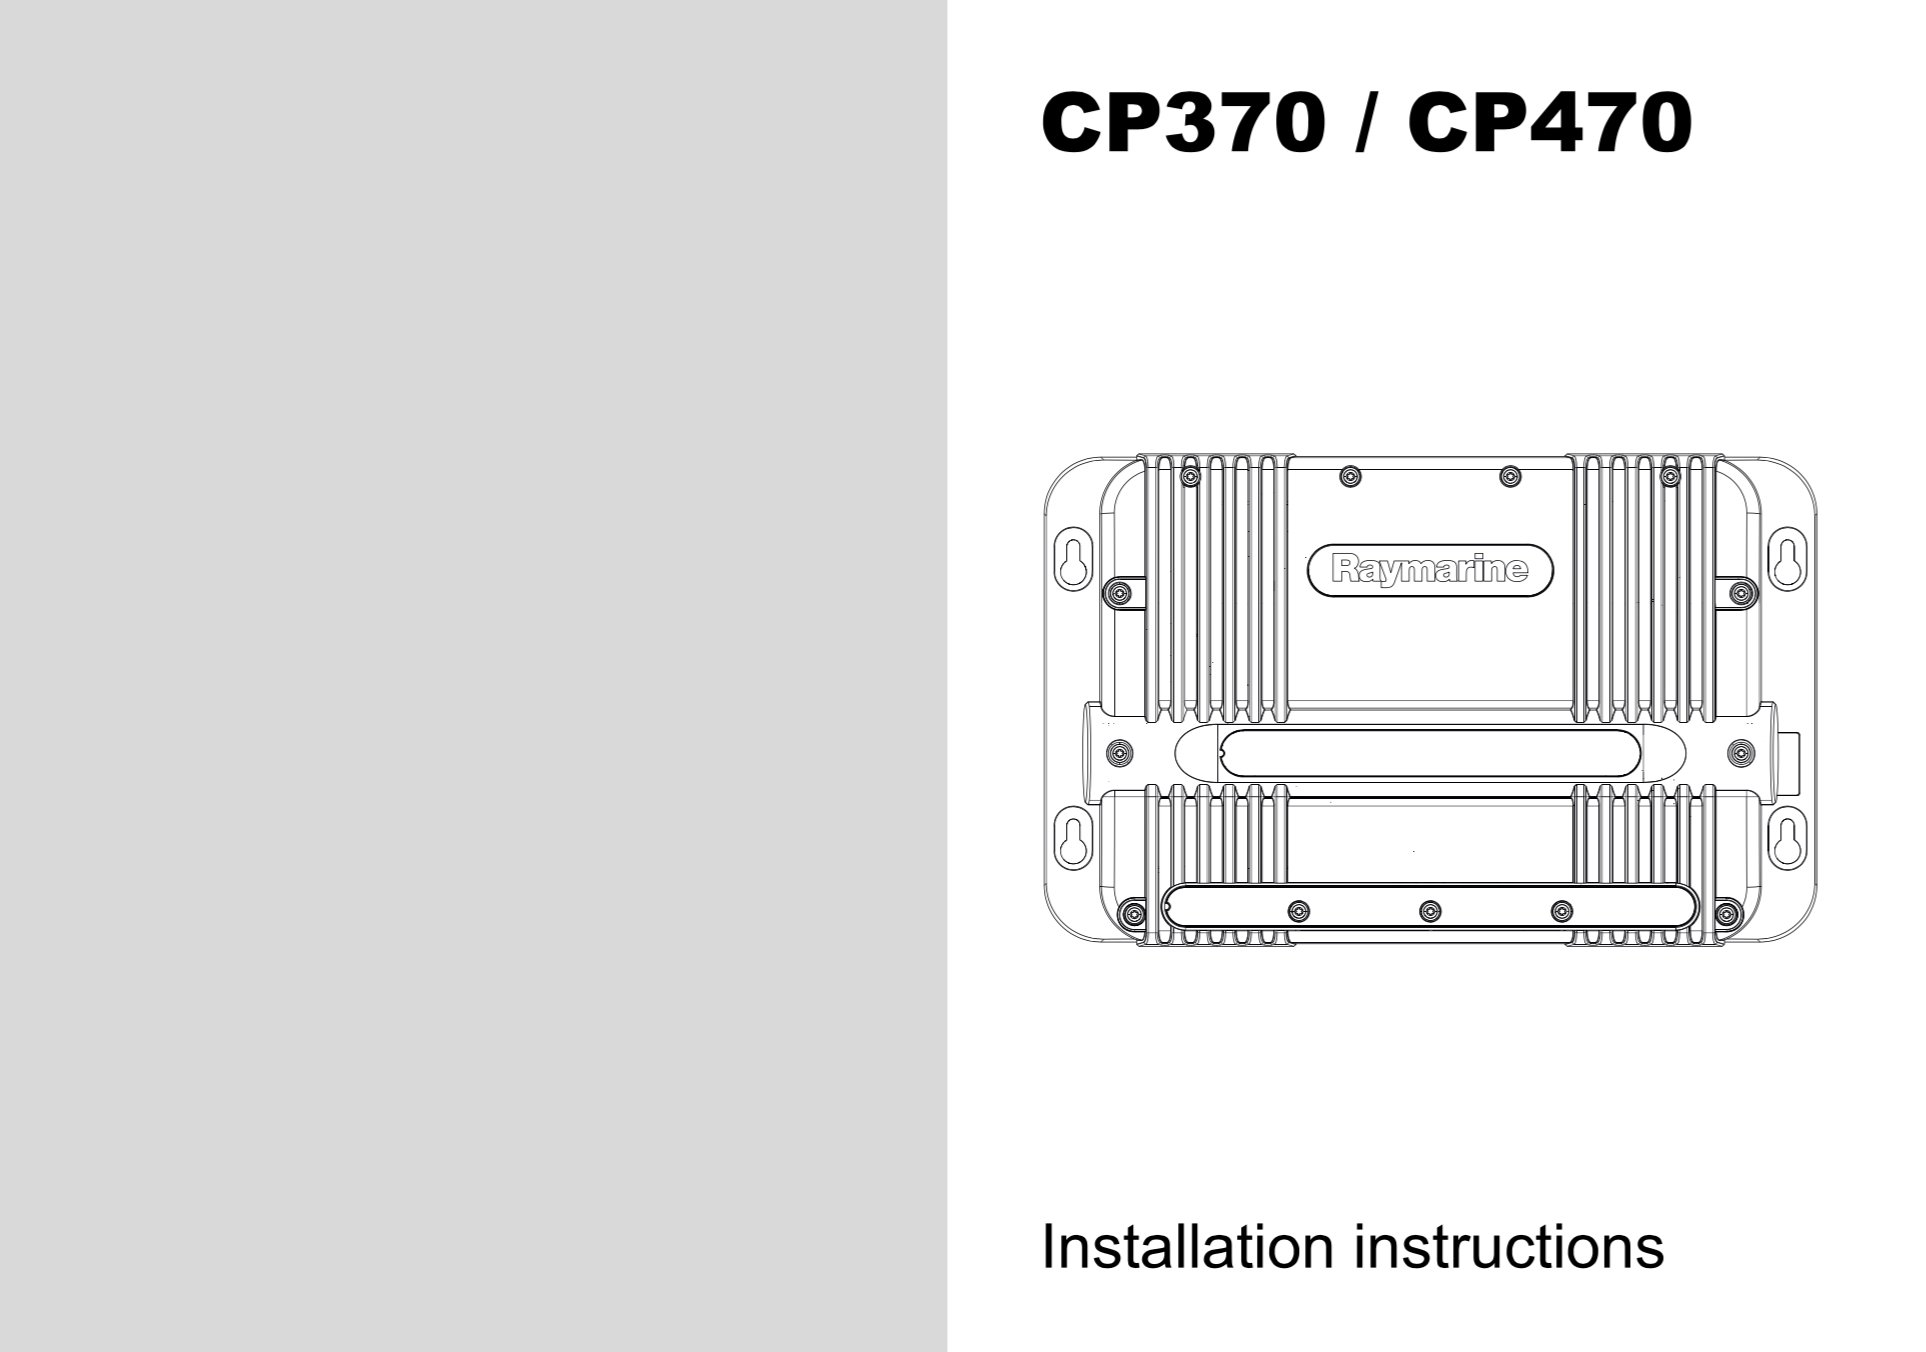 medium resolution of raynet rj45 wiring diagram